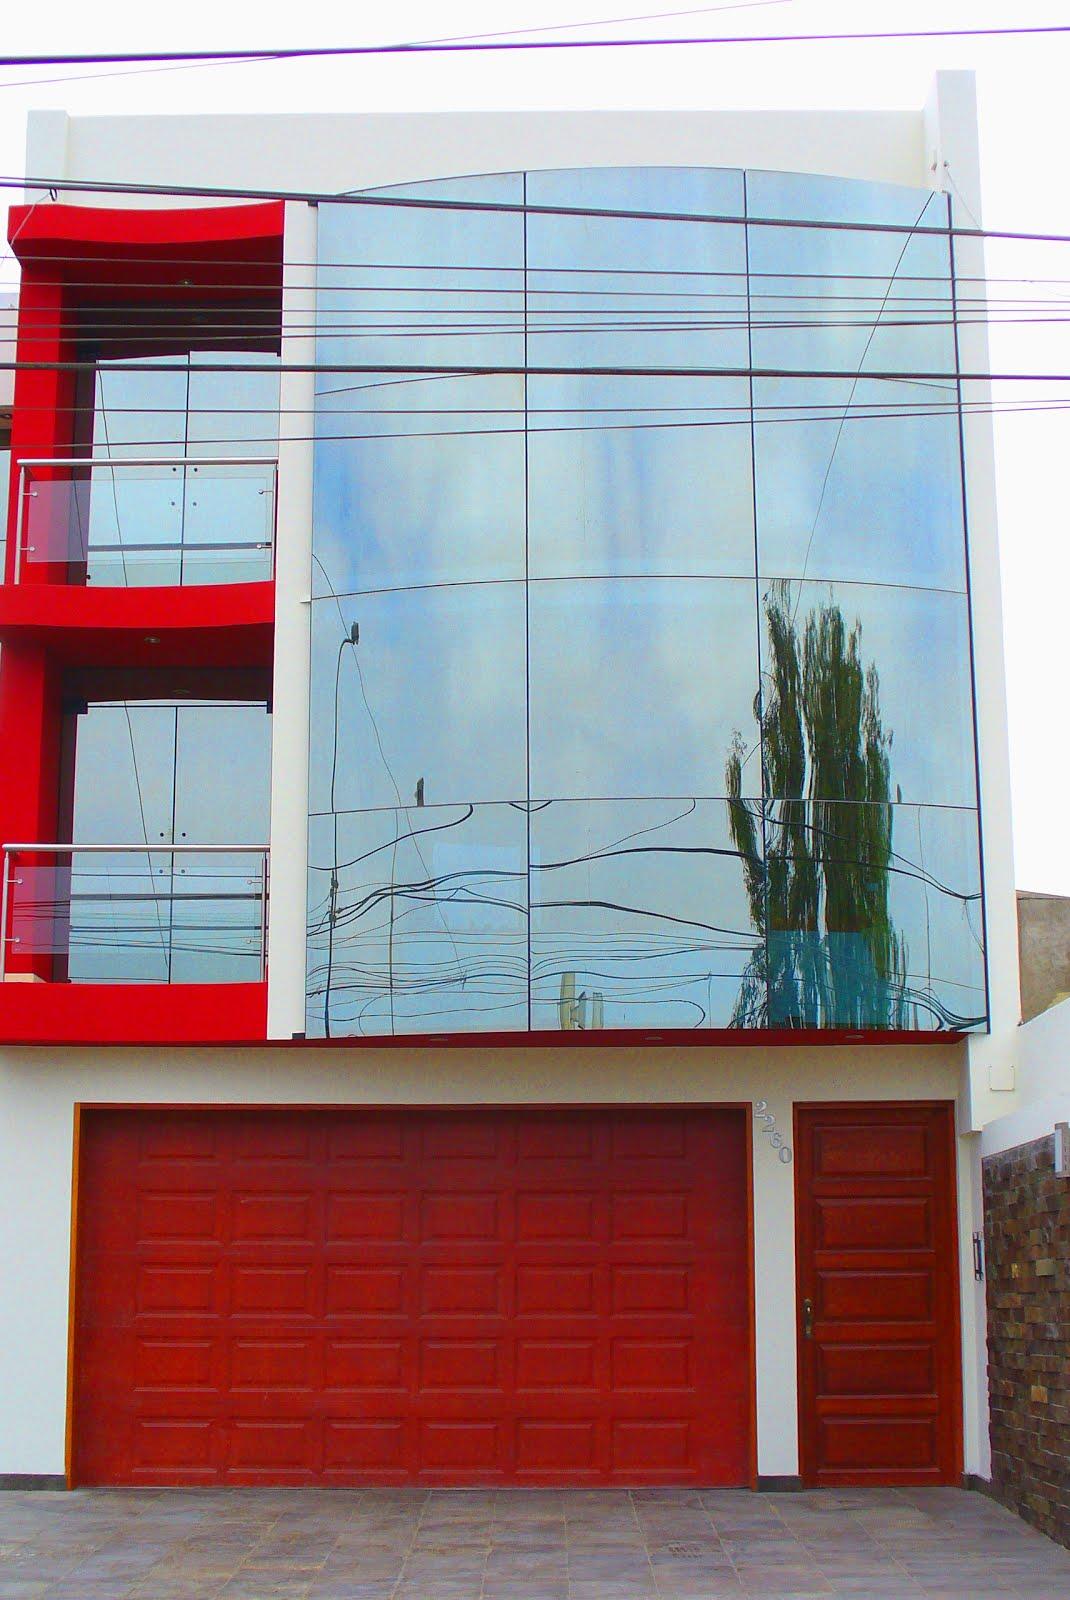 Mamparas de vidrio templado puertas de vidrio templado - Mamparas cristal templado ...